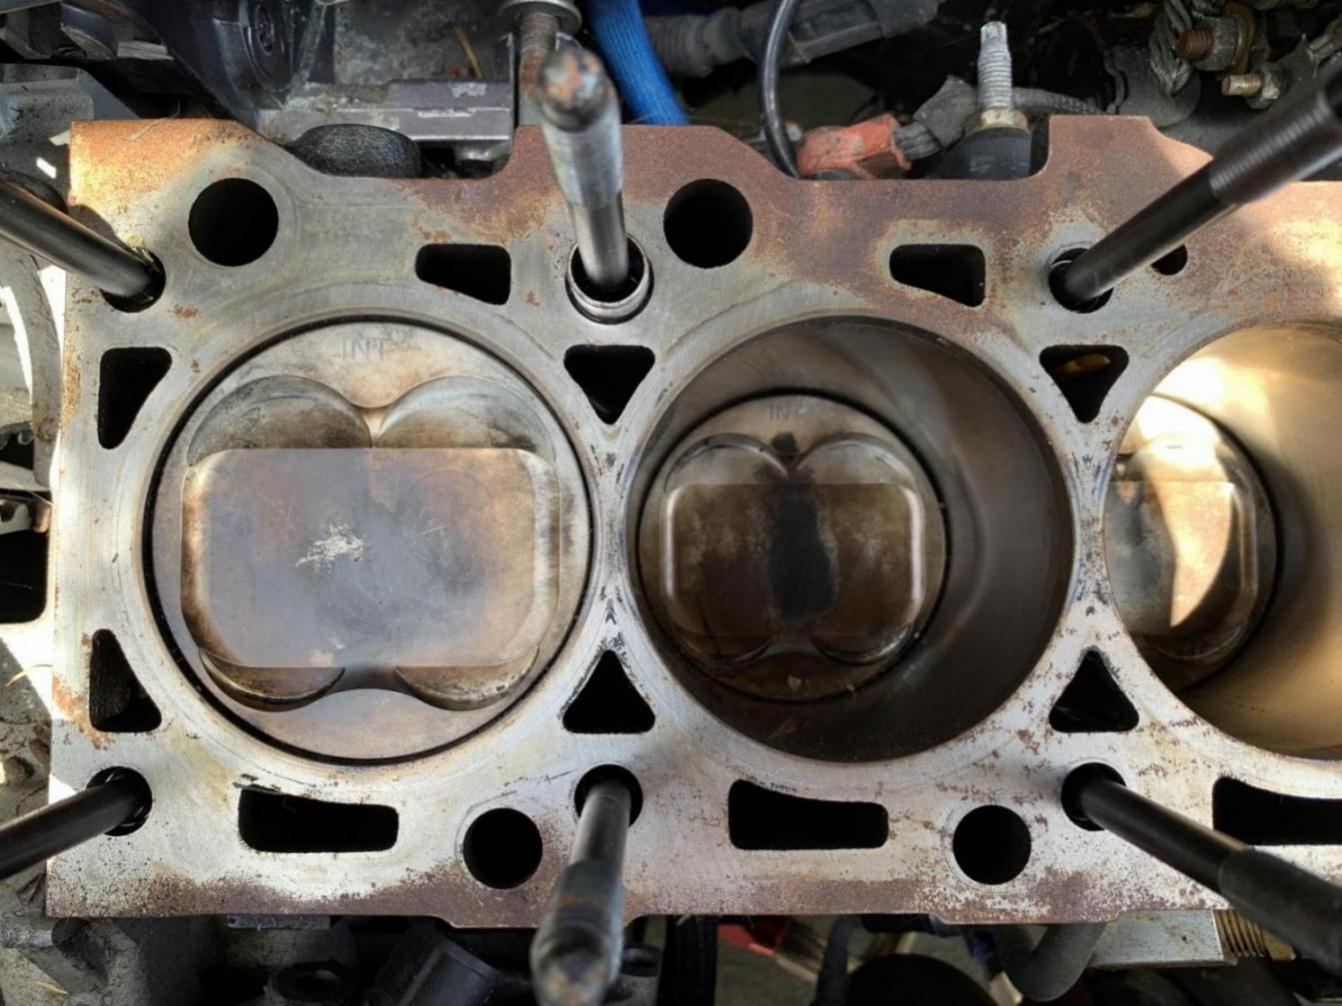 2004 SVTF EAP ZX5 (blown engine)-62bc5dc4-f81d-44a8-8056-3ca55e0402b0_1562680953823.jpg